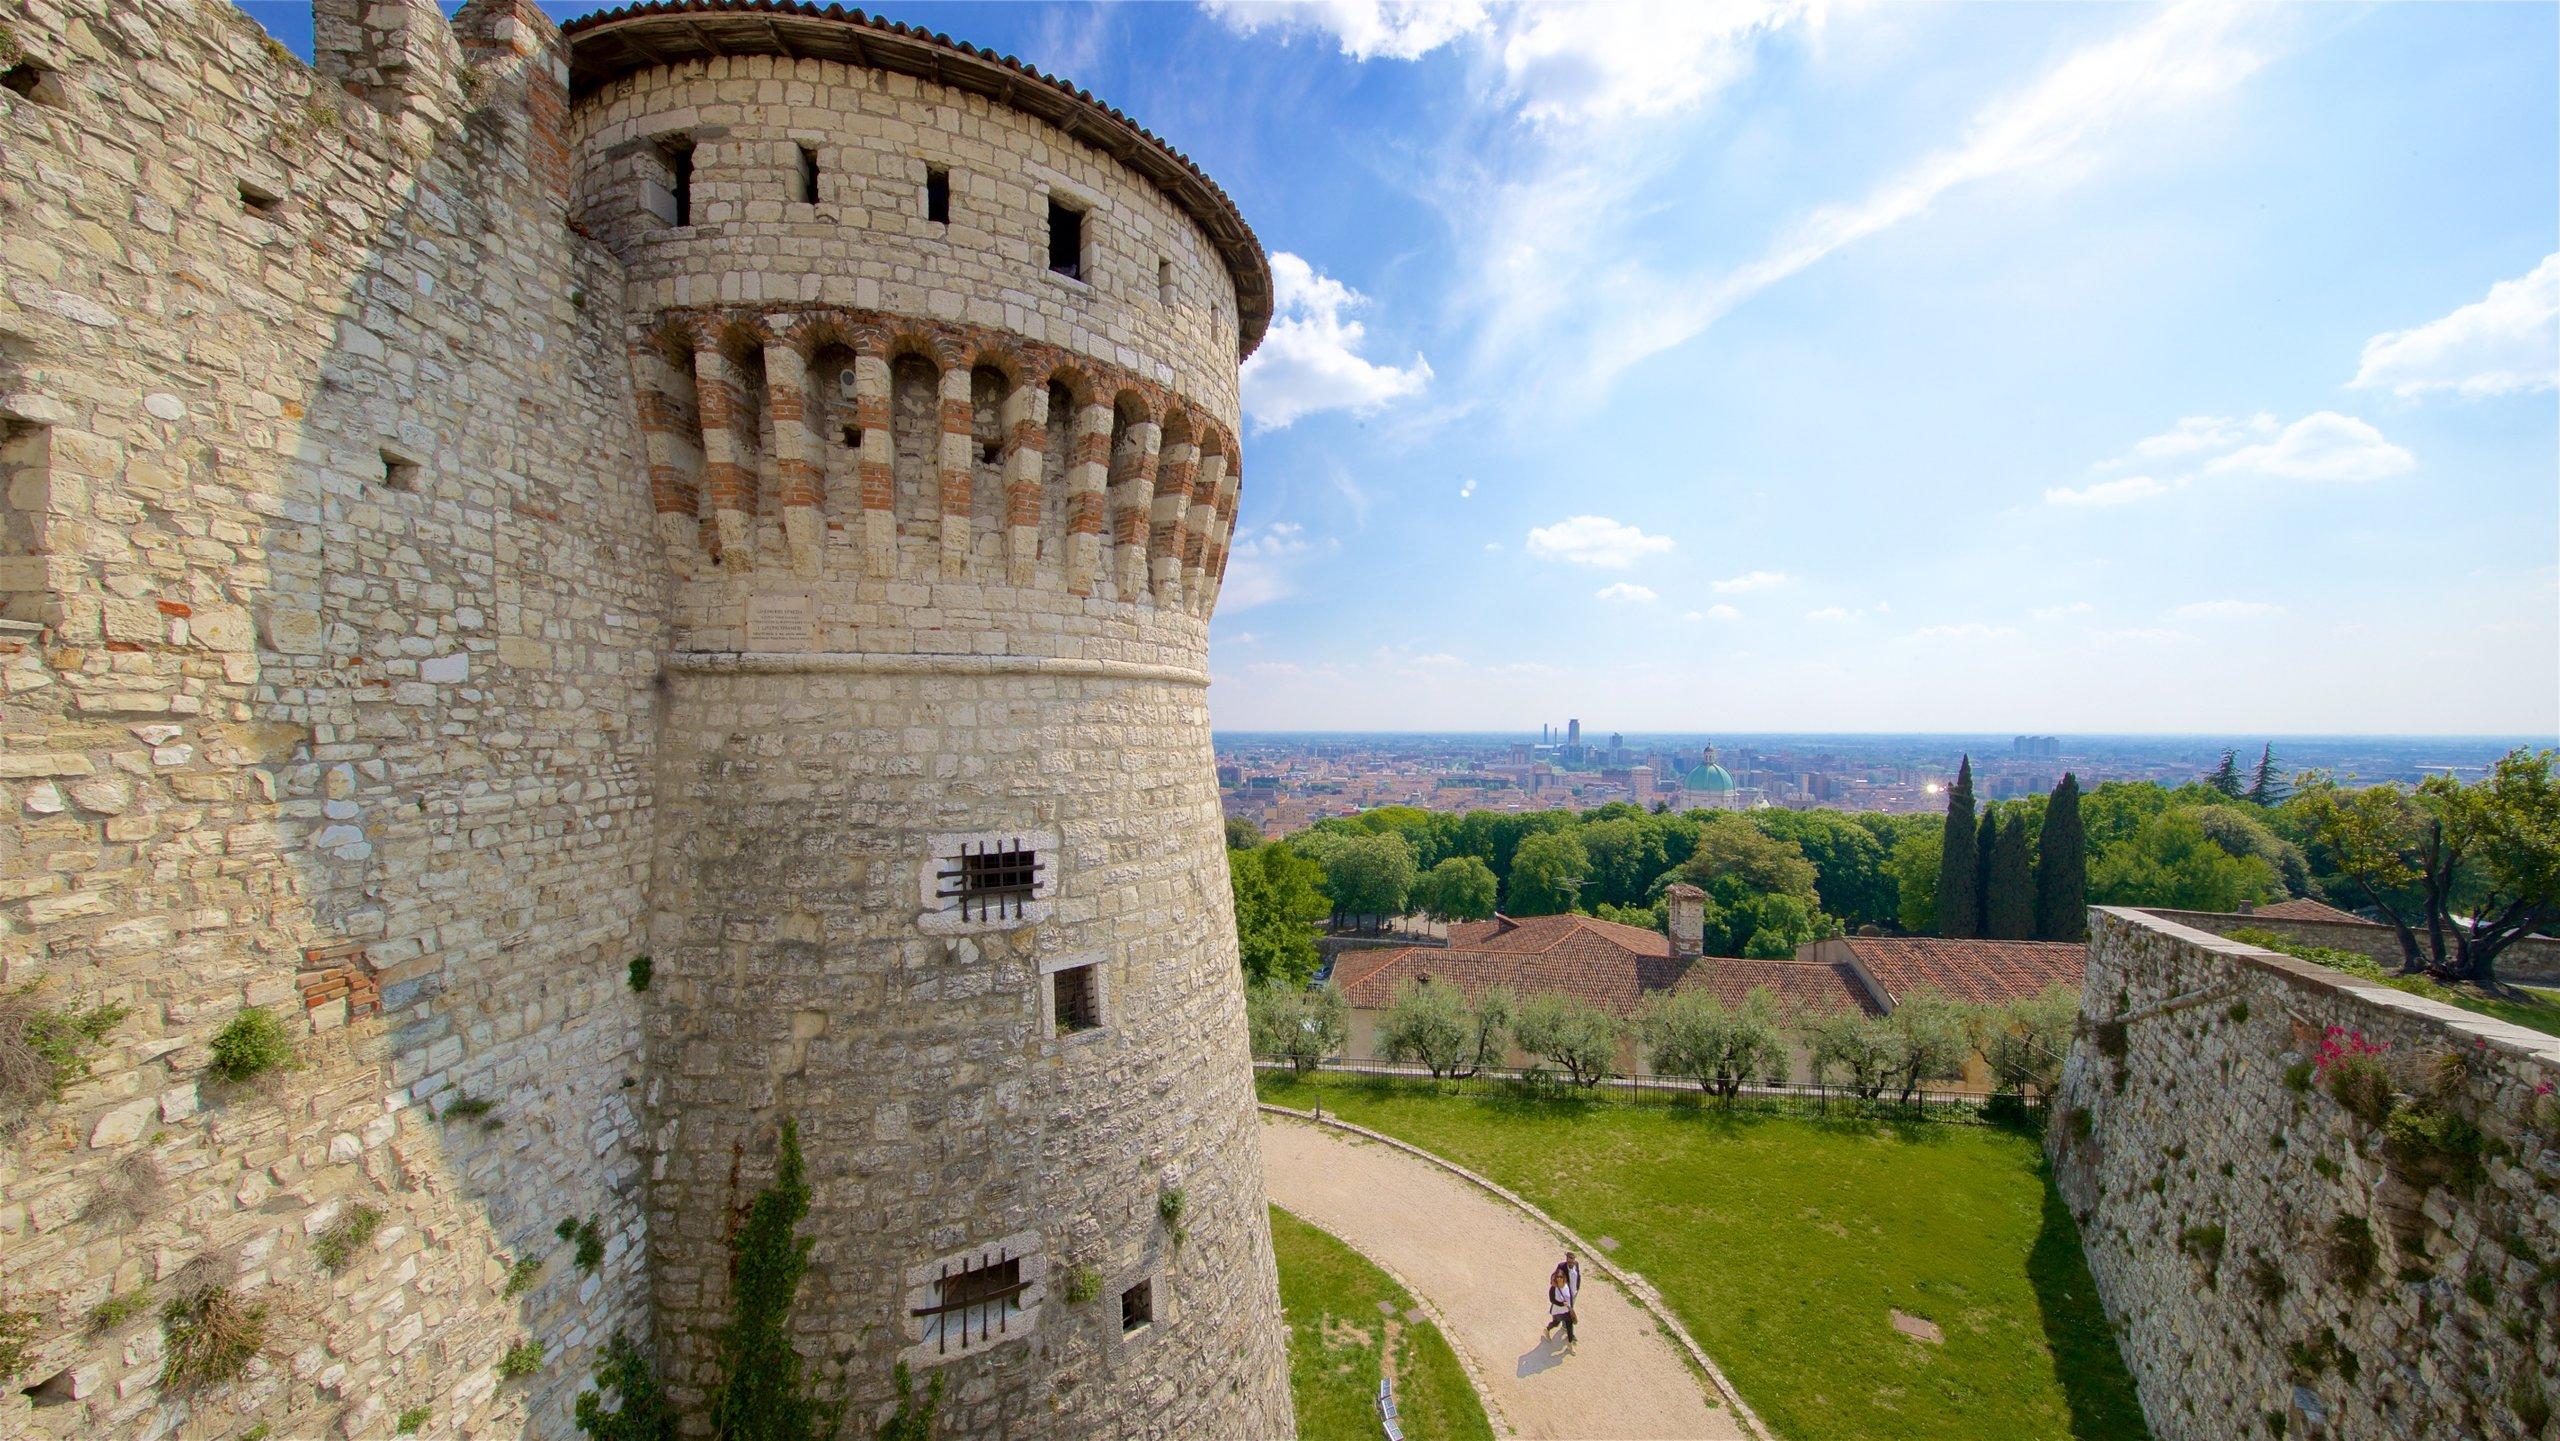 Province of Brescia, Lombardy, Italy